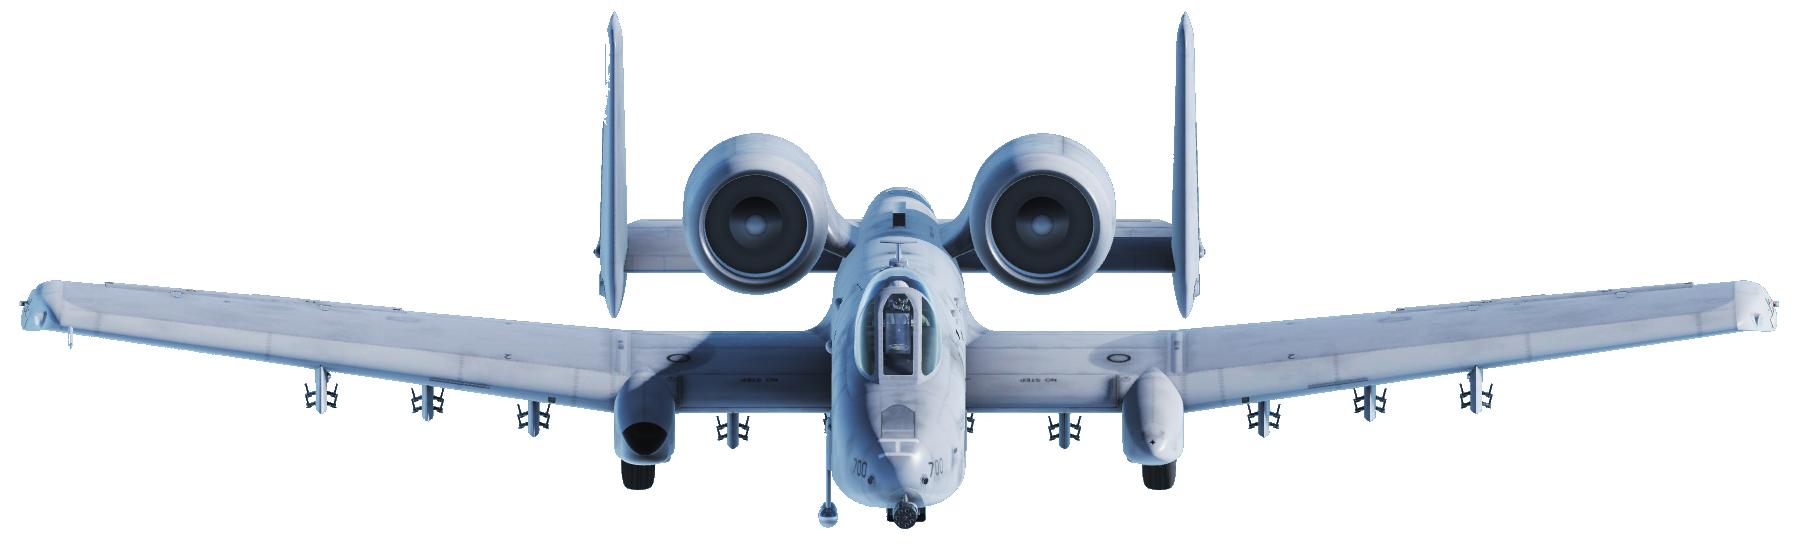 A-10C, Picture from kaltokri, Public Domain